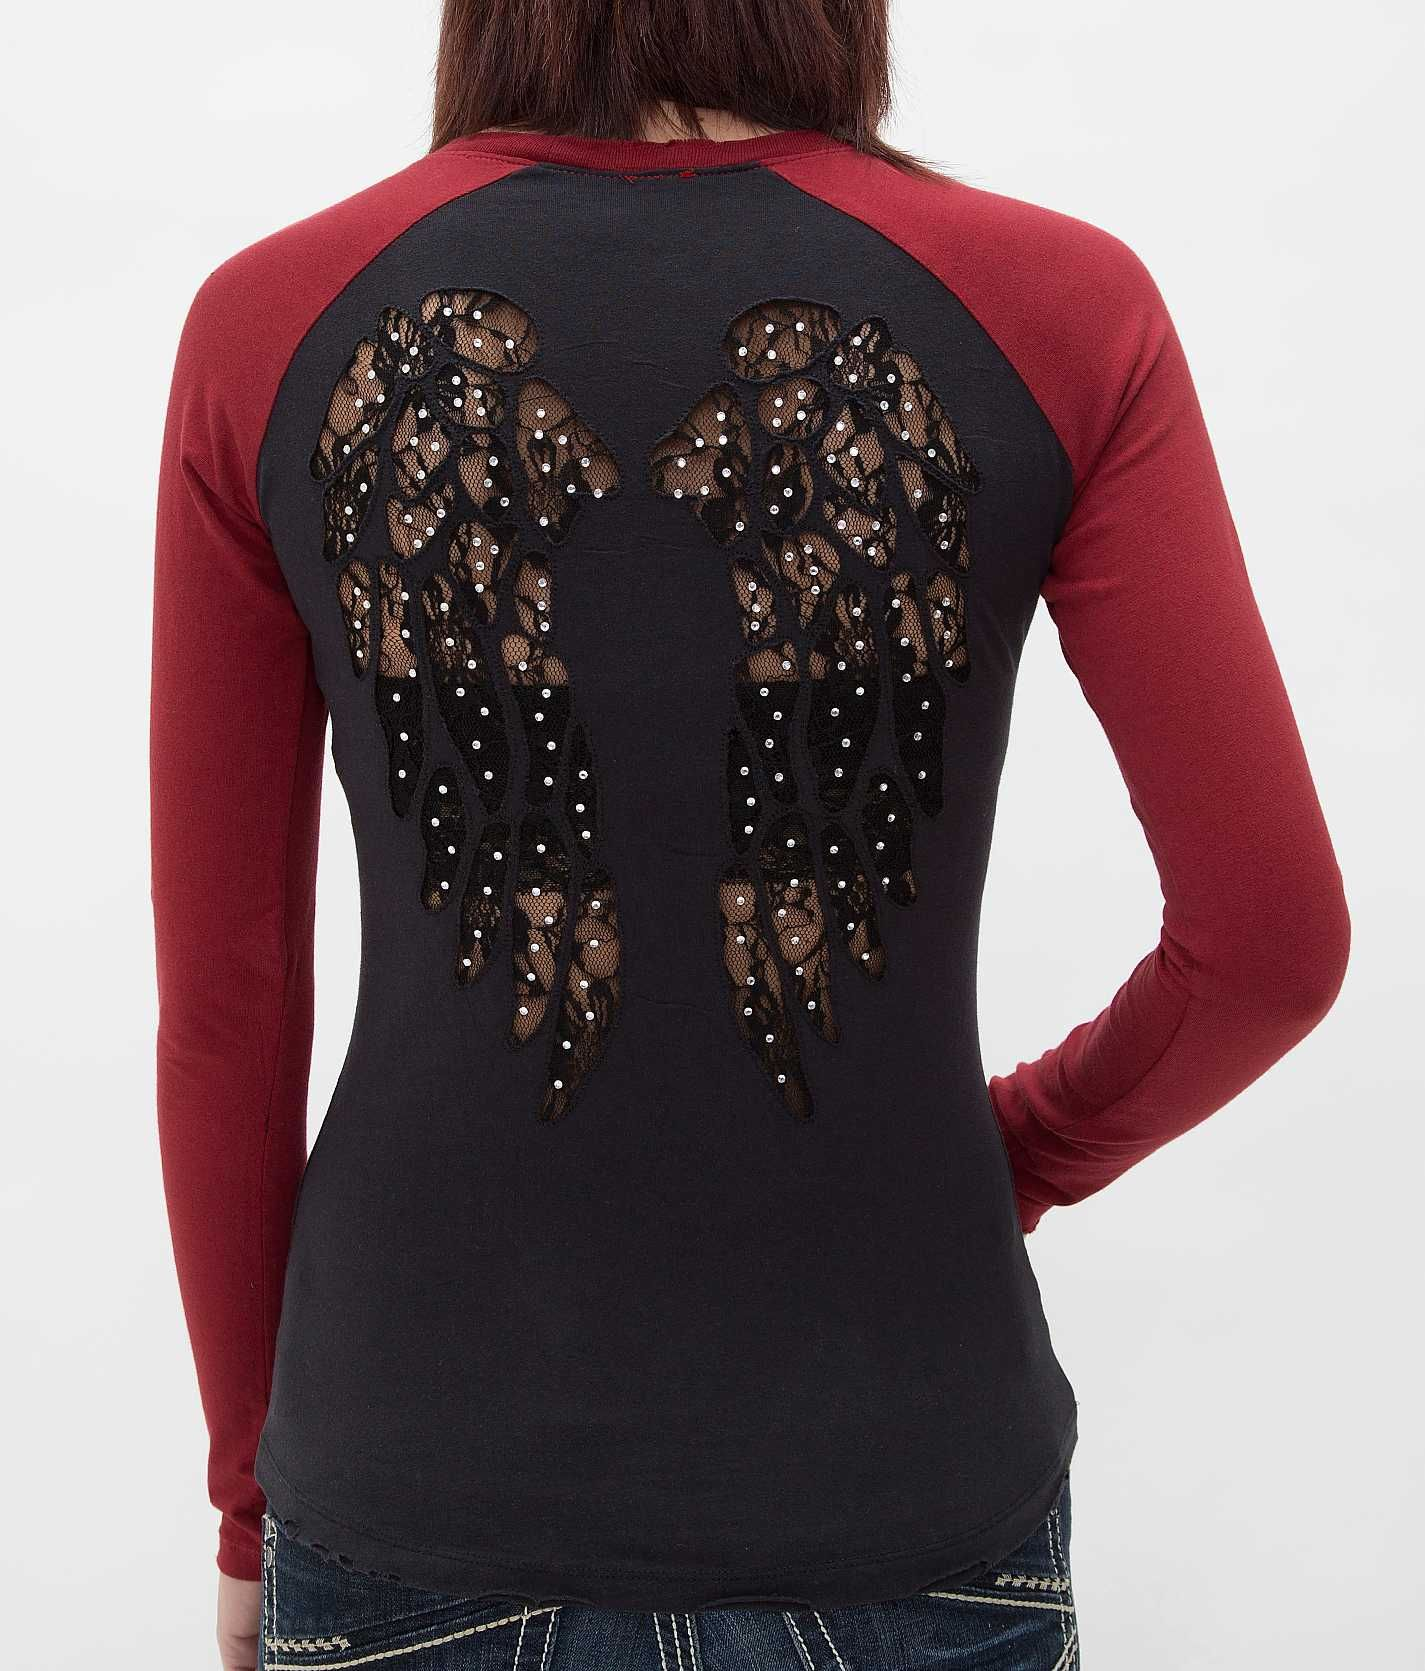 Women's tattoo designs on back sinful carmelita tshirt  womenus shirtstops  buckle  clothes